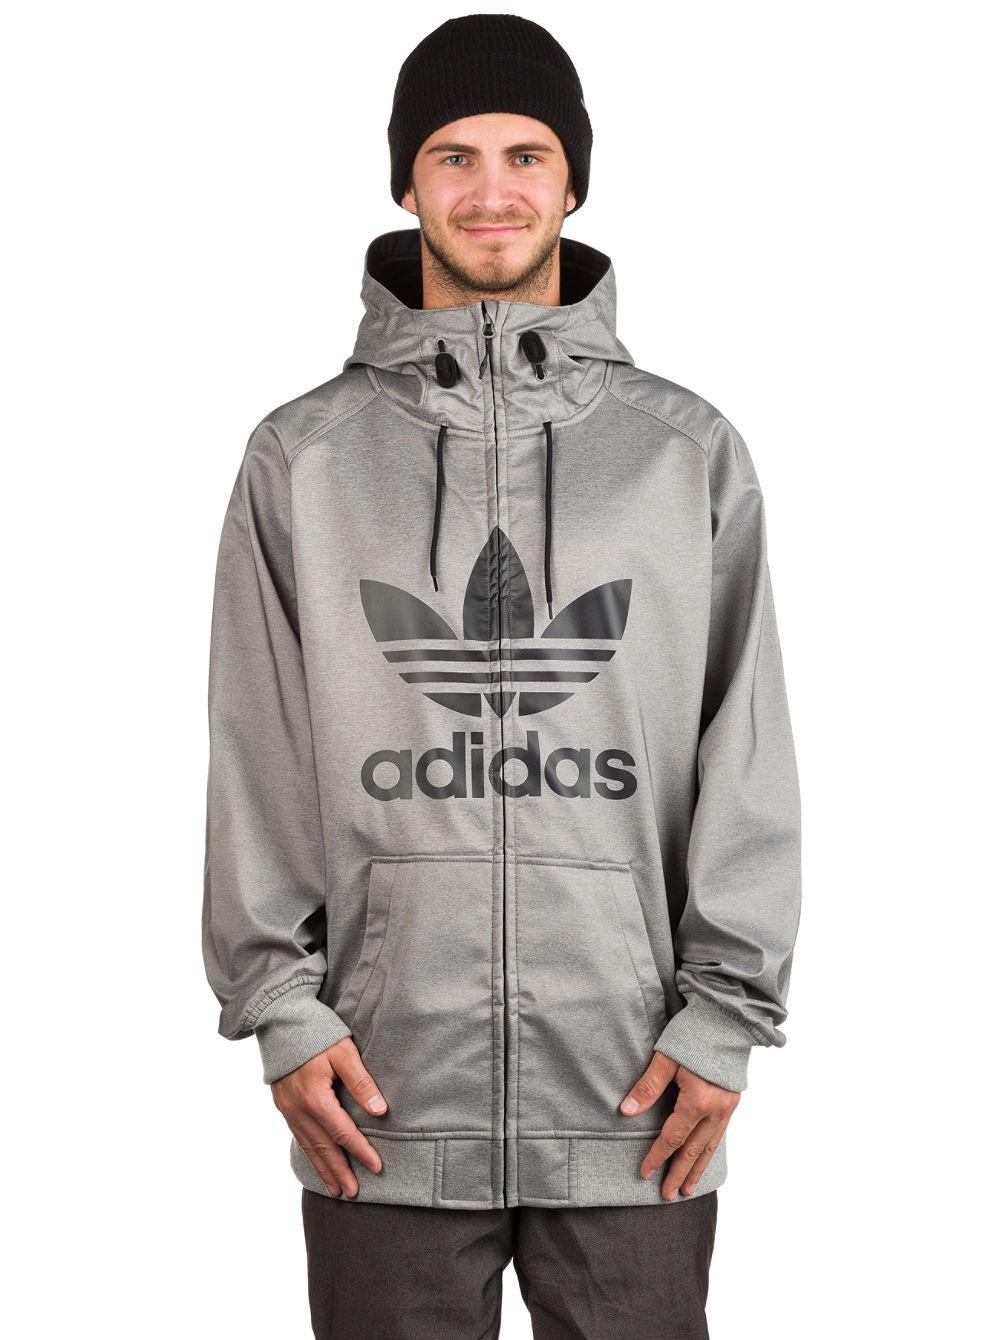 1da0135be65 adidas Snowboarding Greeley Soft Shell Jas online kopen bij Blue Tomato